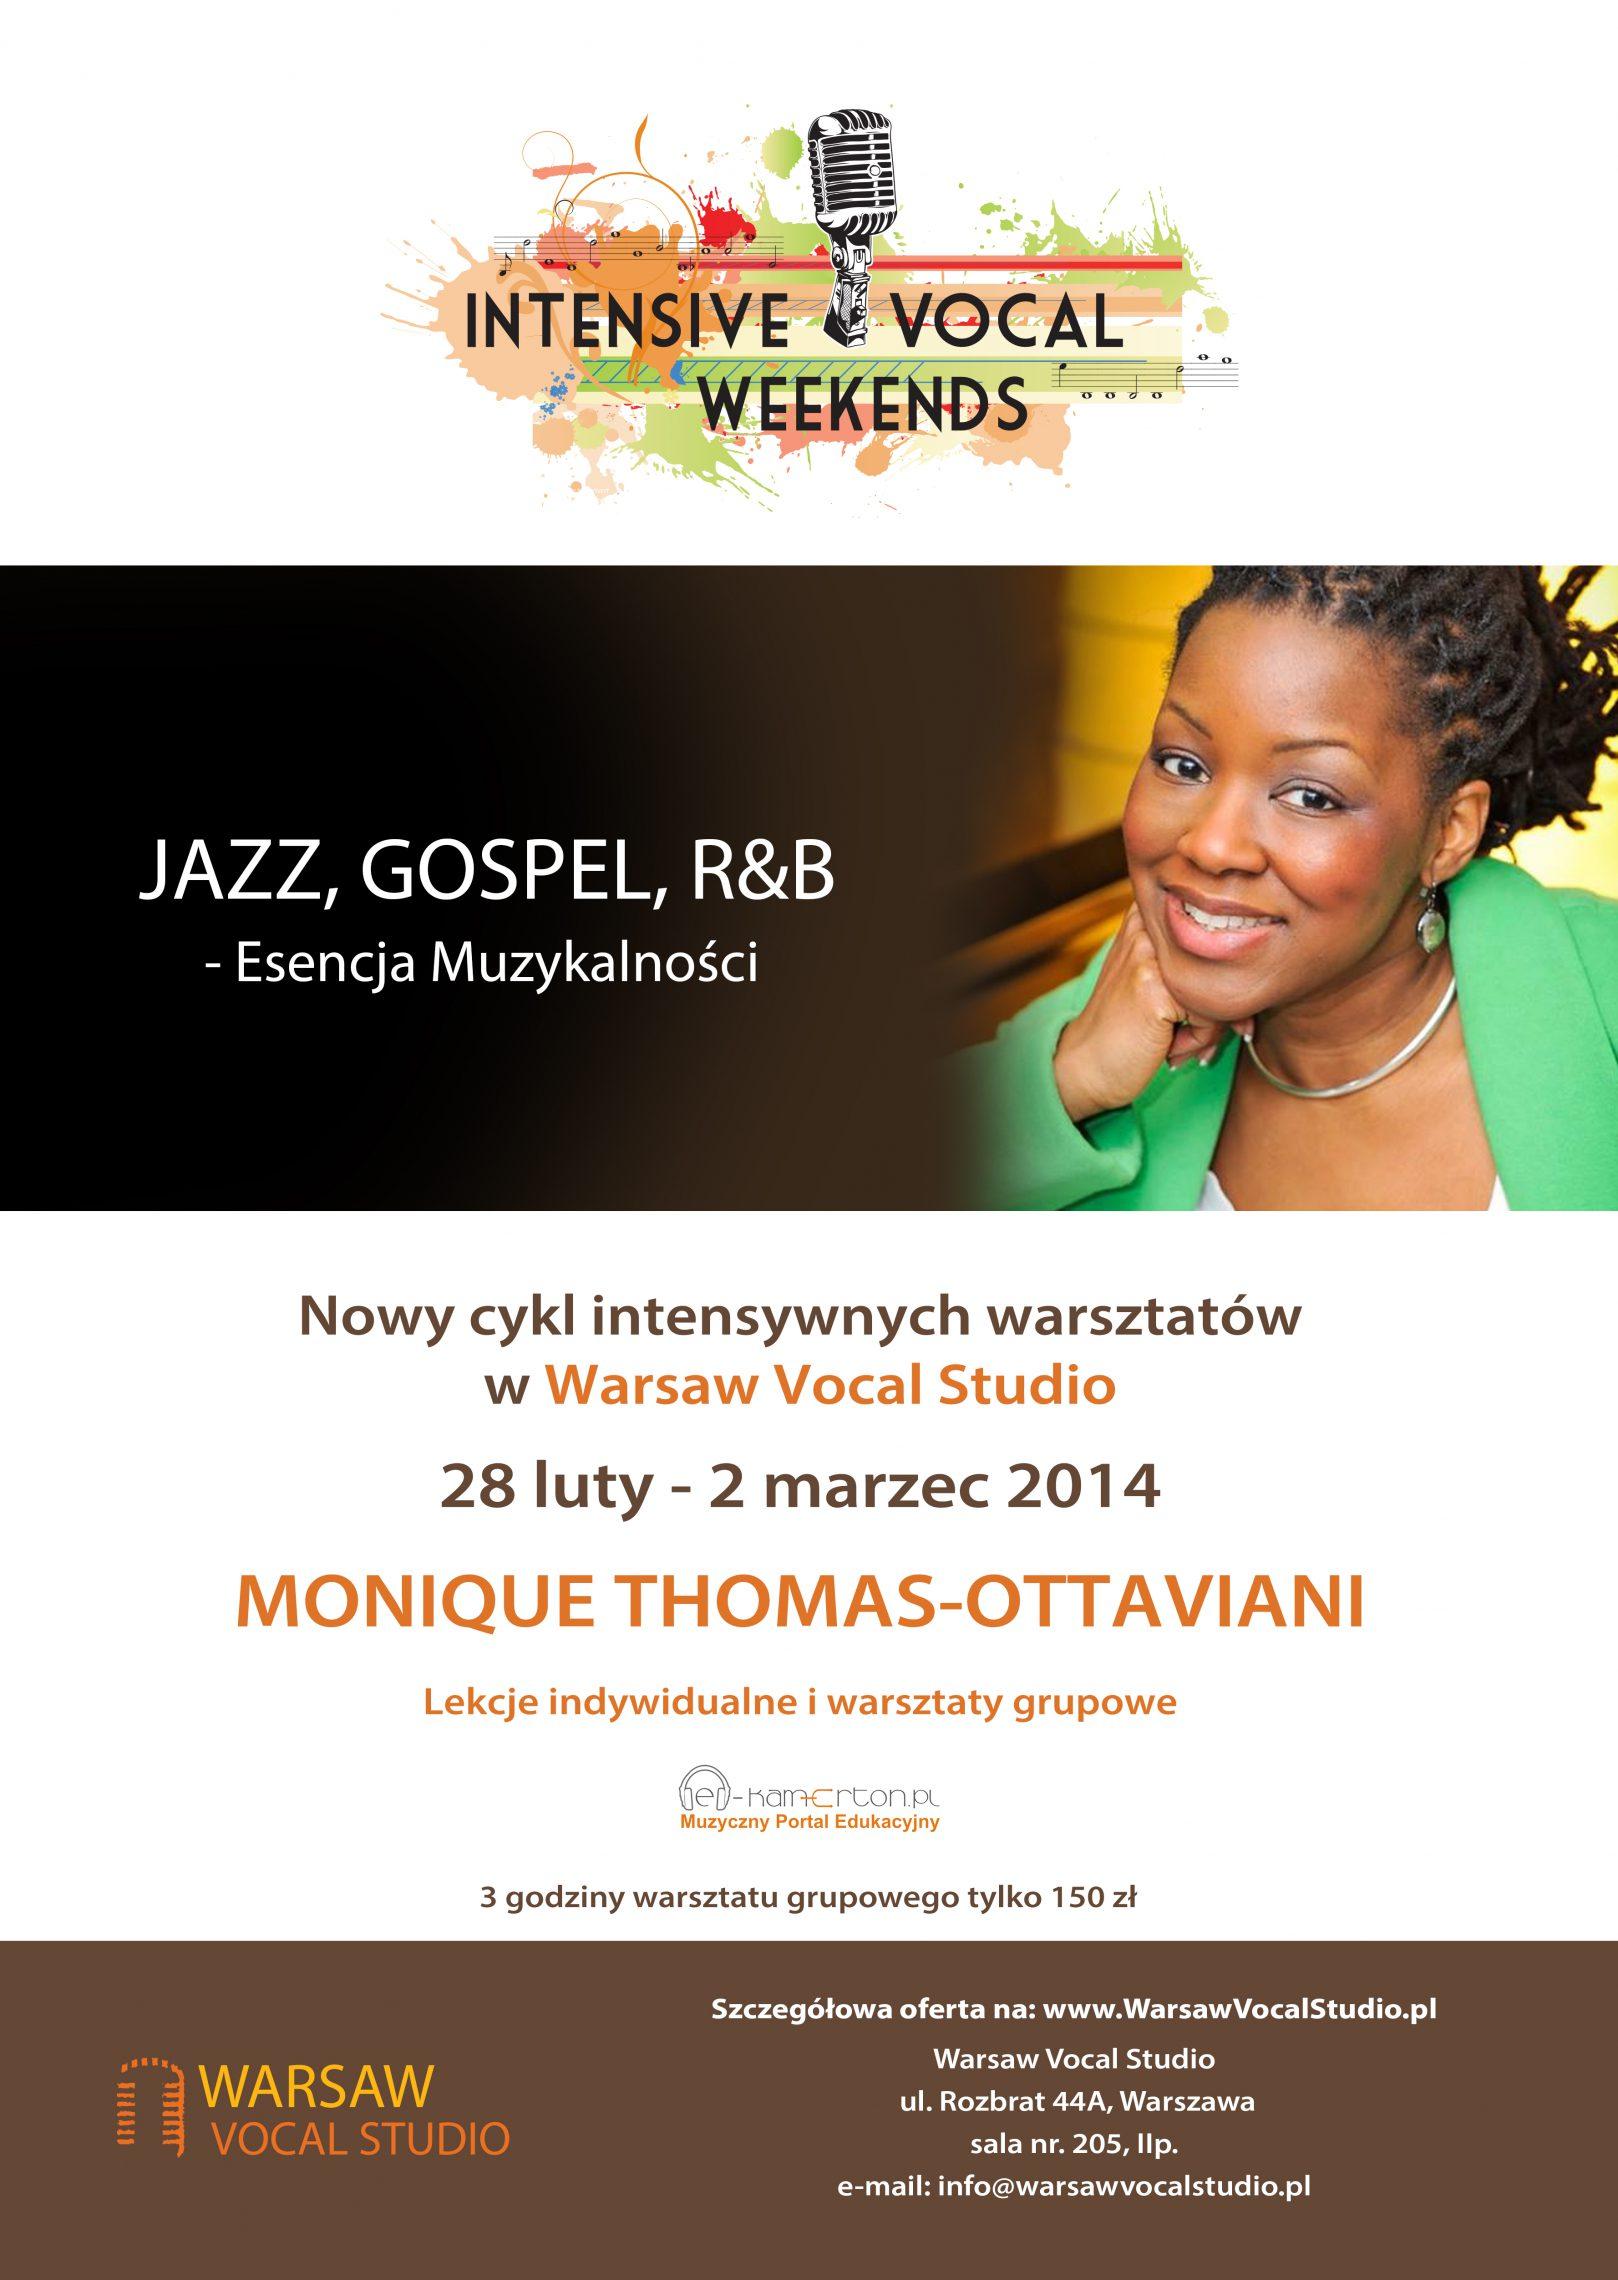 Warsztaty wokalne z Monique Thomas-Ottaviani